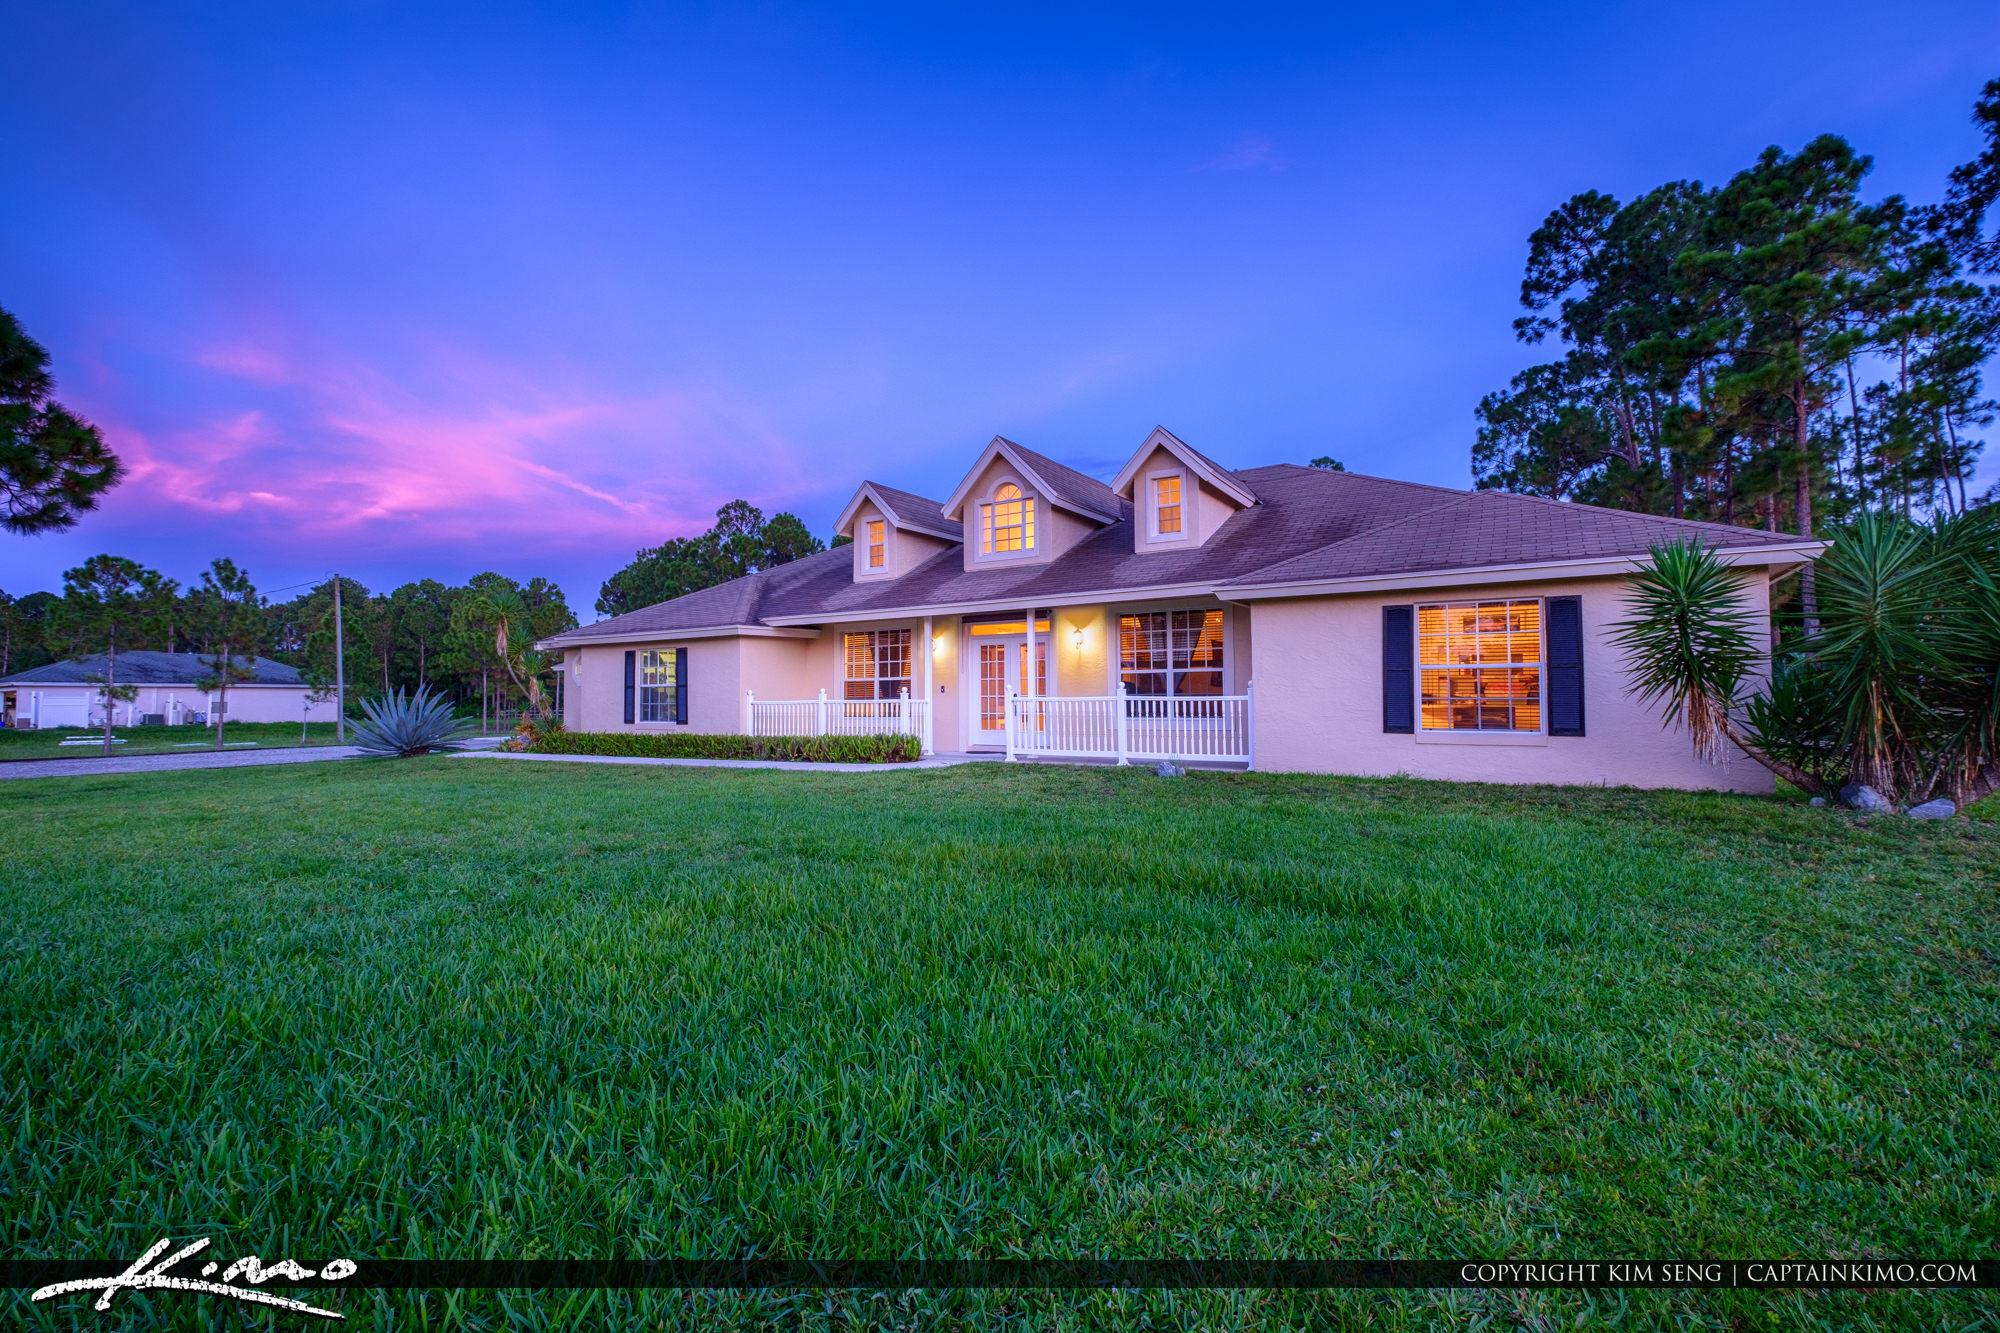 Real Estate Photography Loxahatchee Florida Twilight Front of Ho